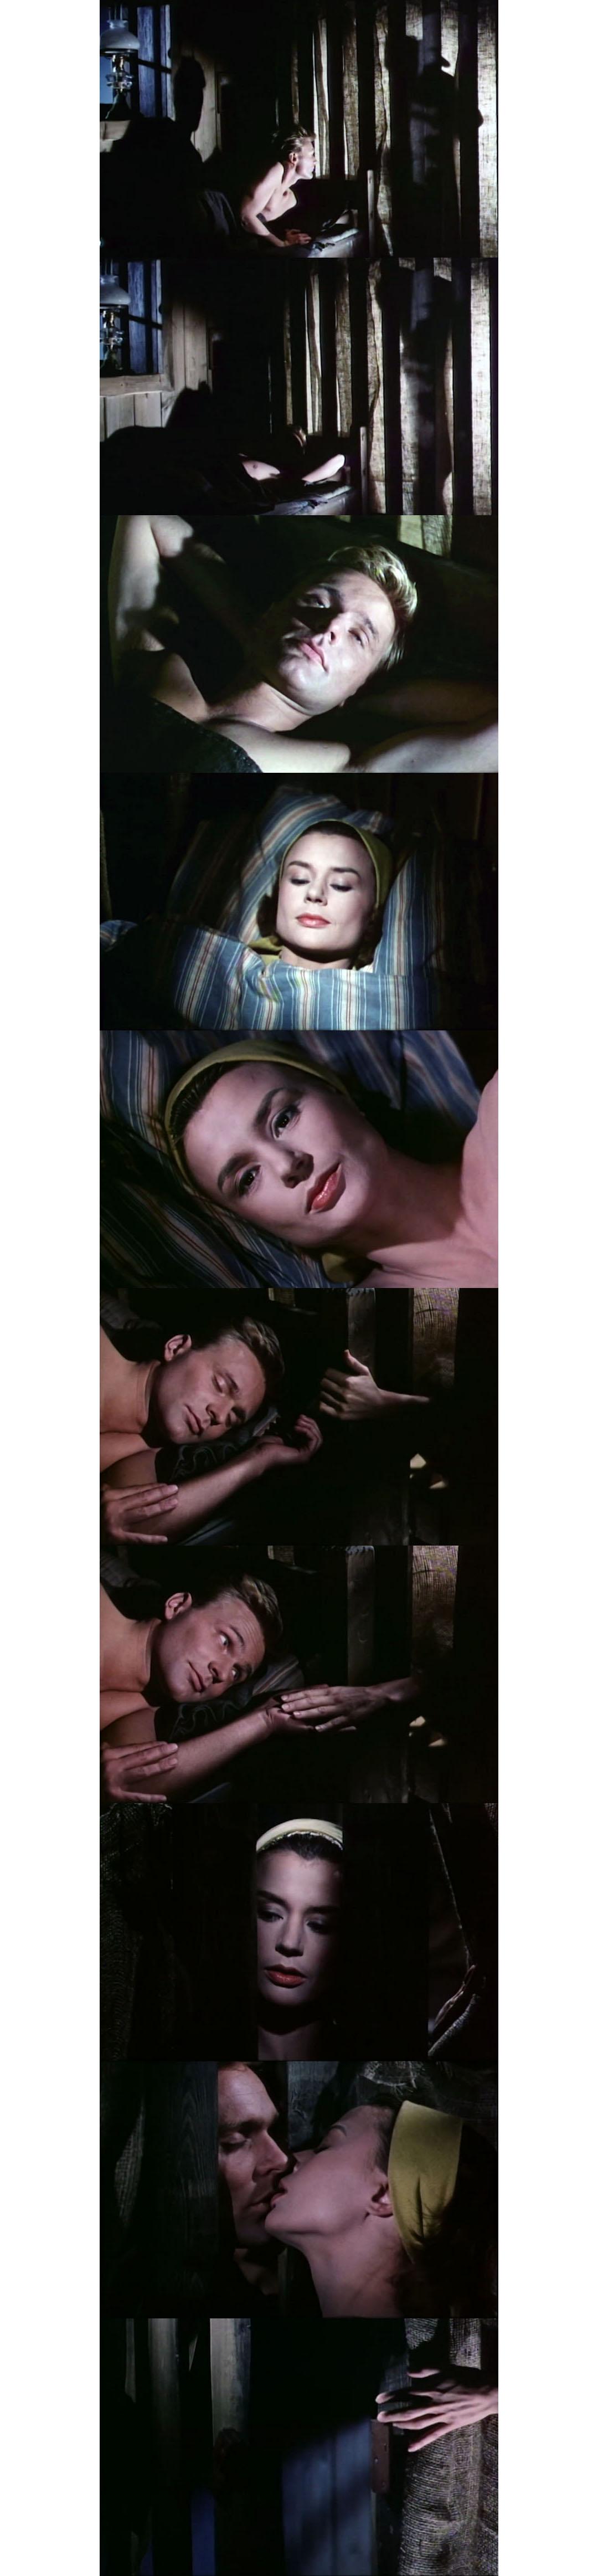 "Szenenfolge aus ""Barbara"" (1961)"